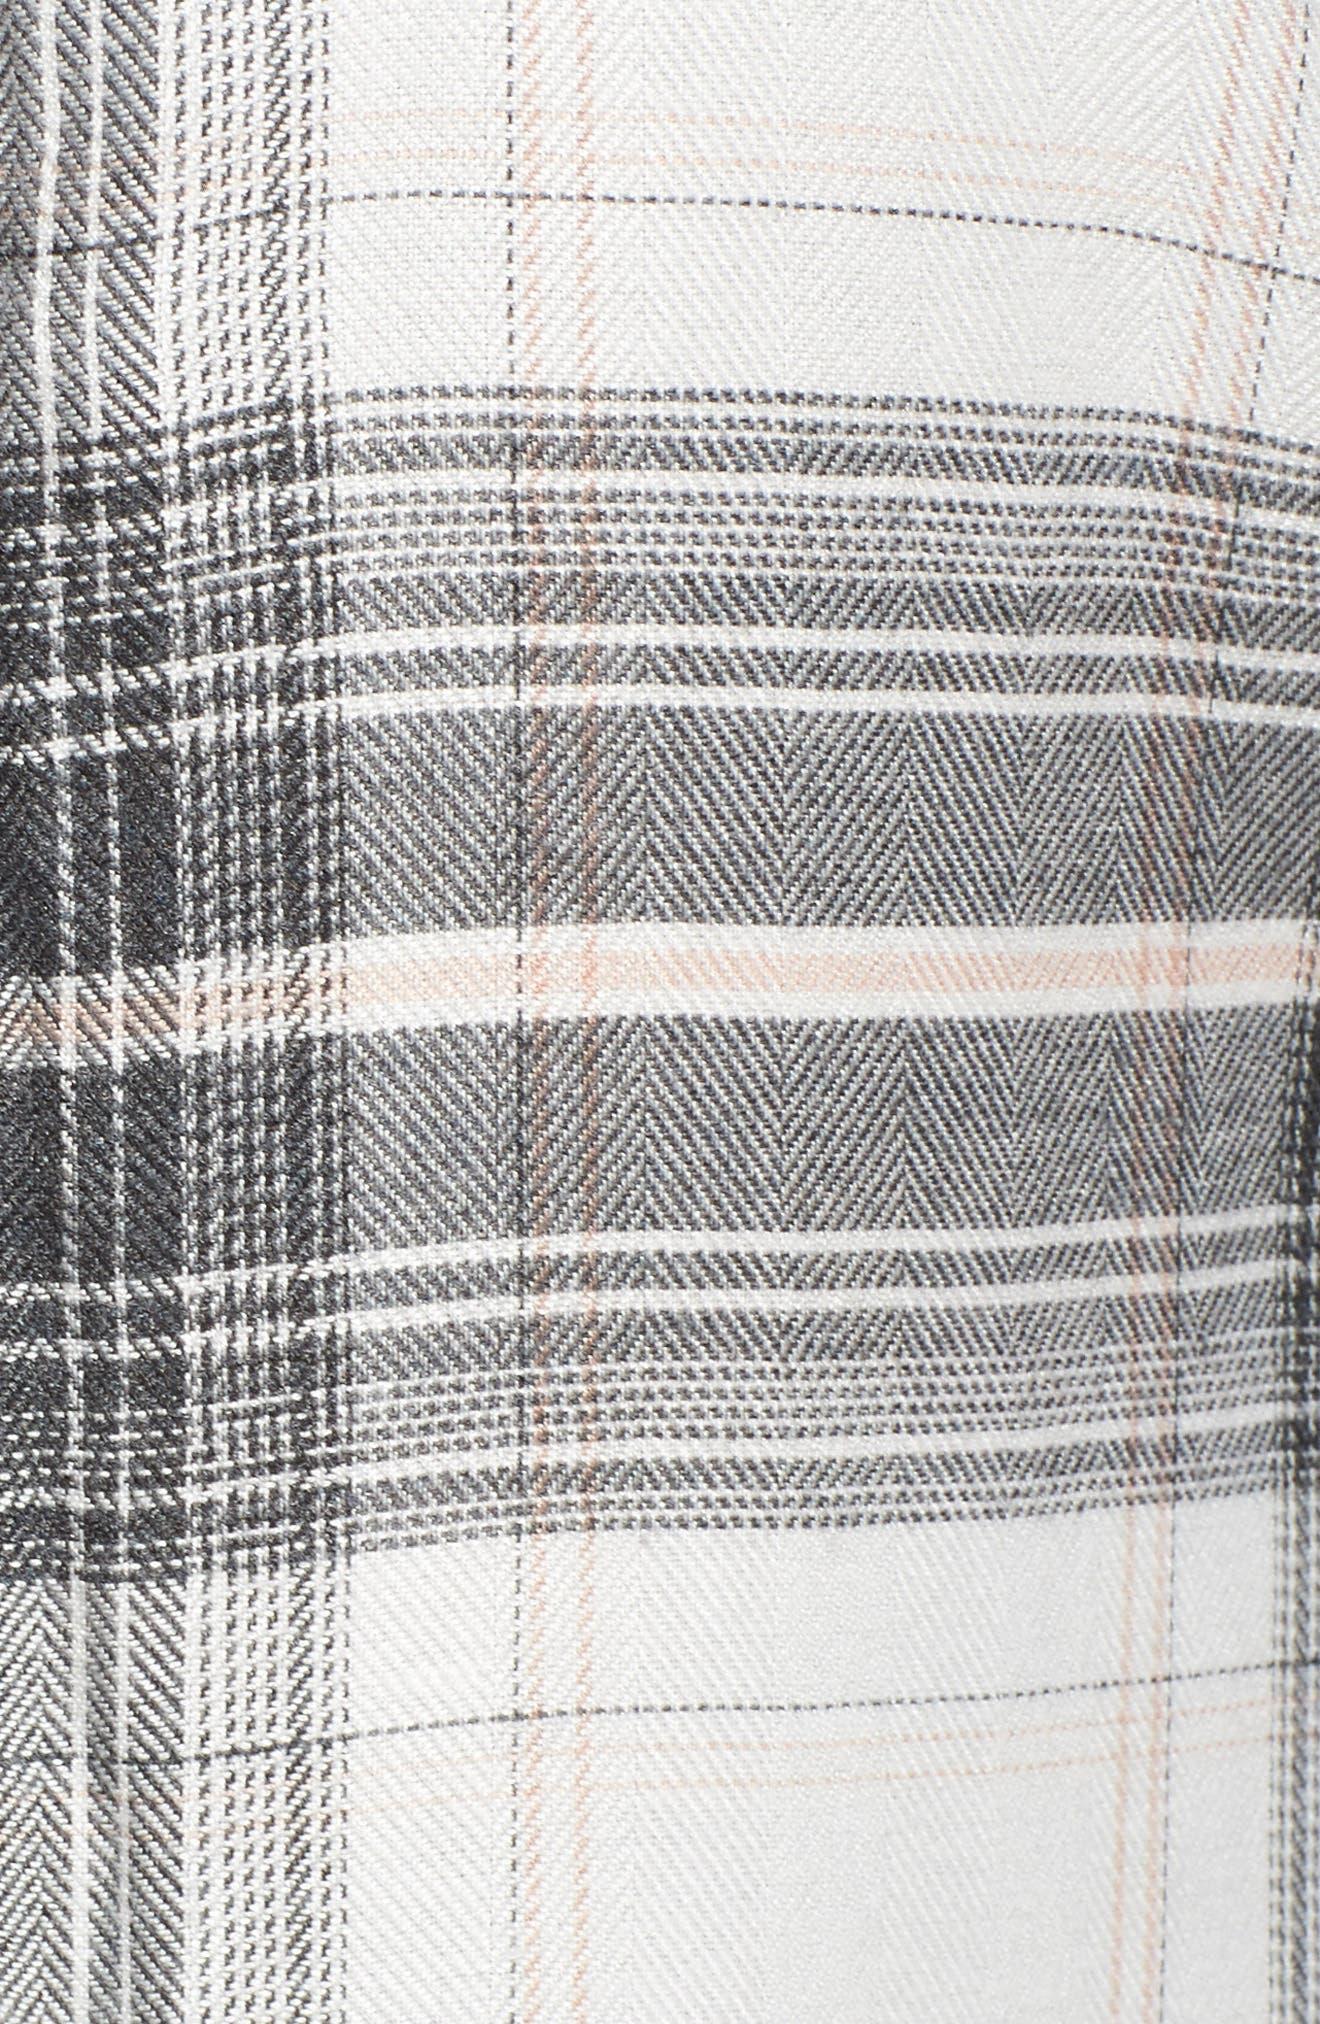 Cold Elbow Linearscape Plaid Shirt,                             Alternate thumbnail 5, color,                             669